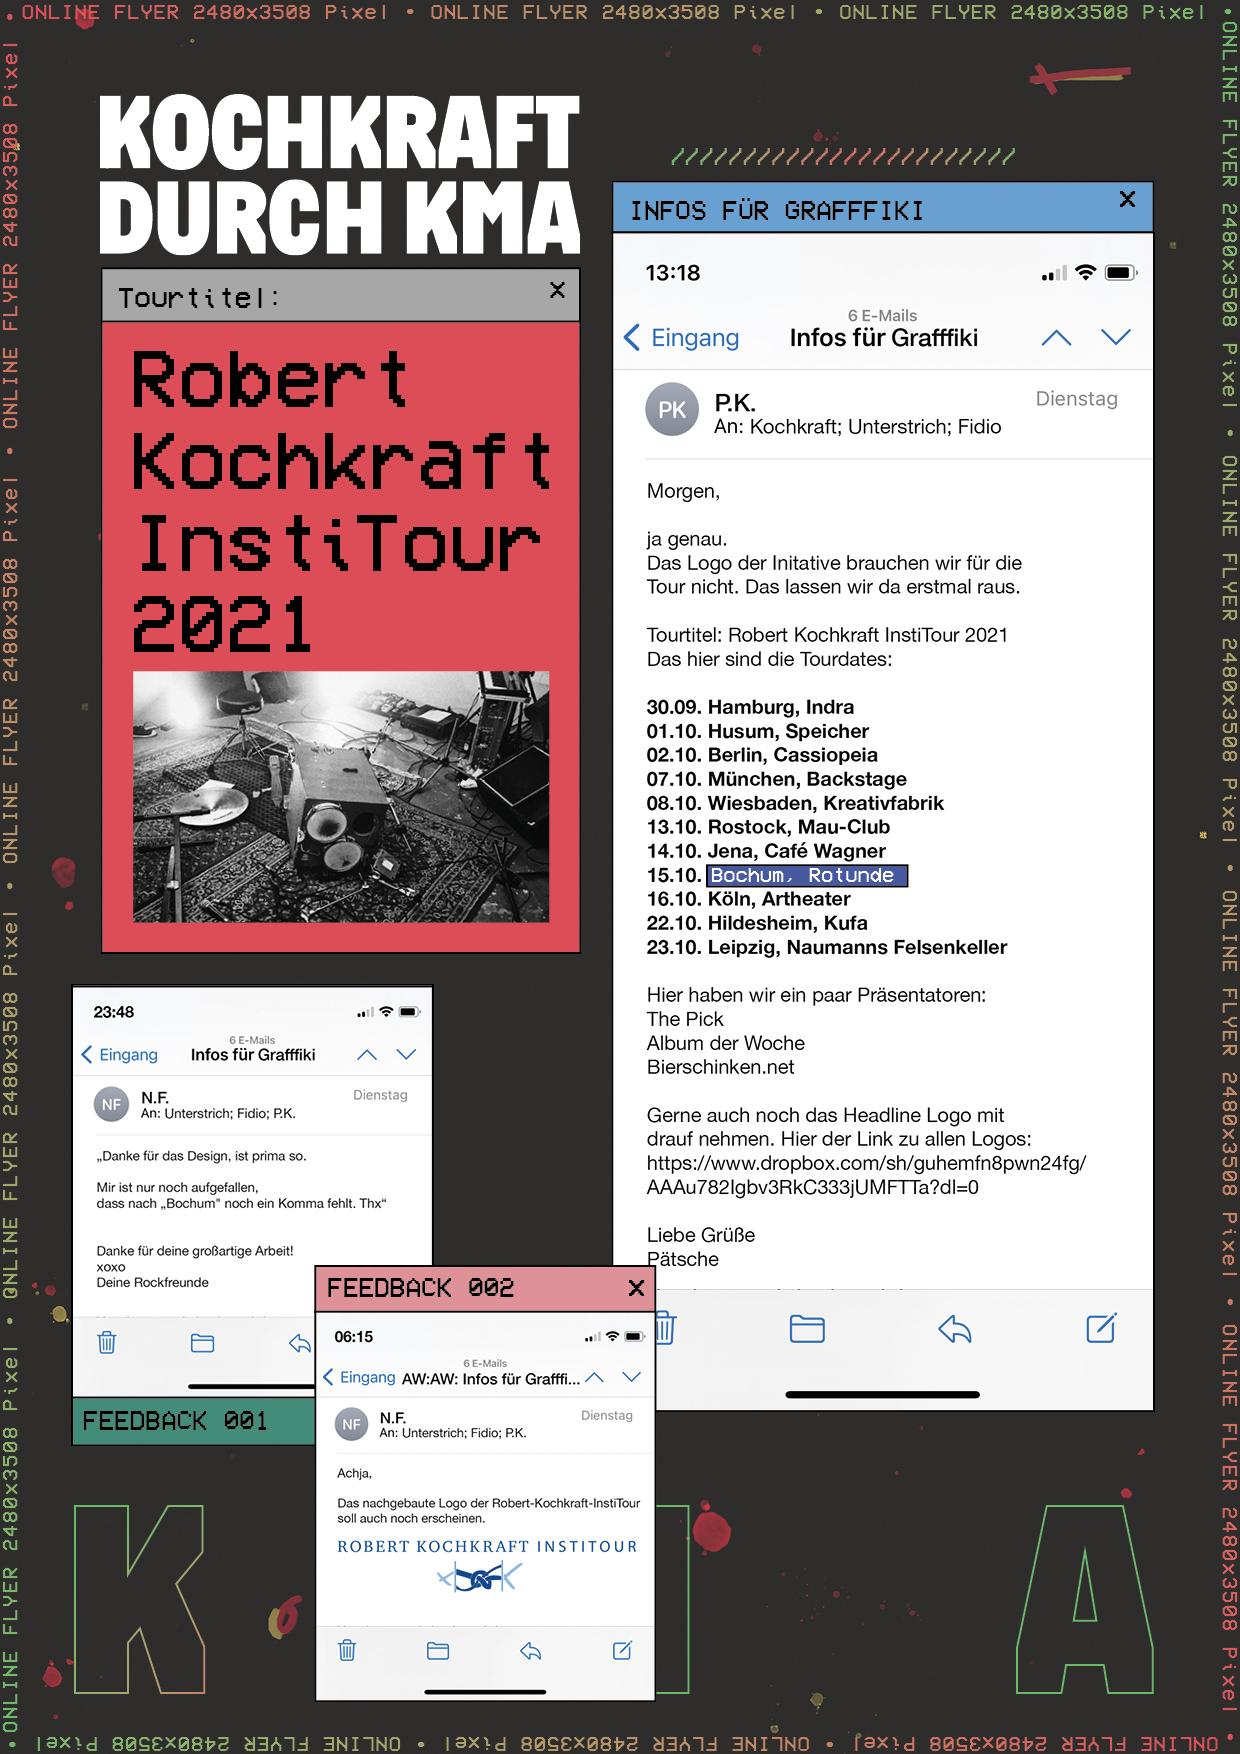 Kochkraft durch KMA - Robert Kochkraft InstiTour 2021